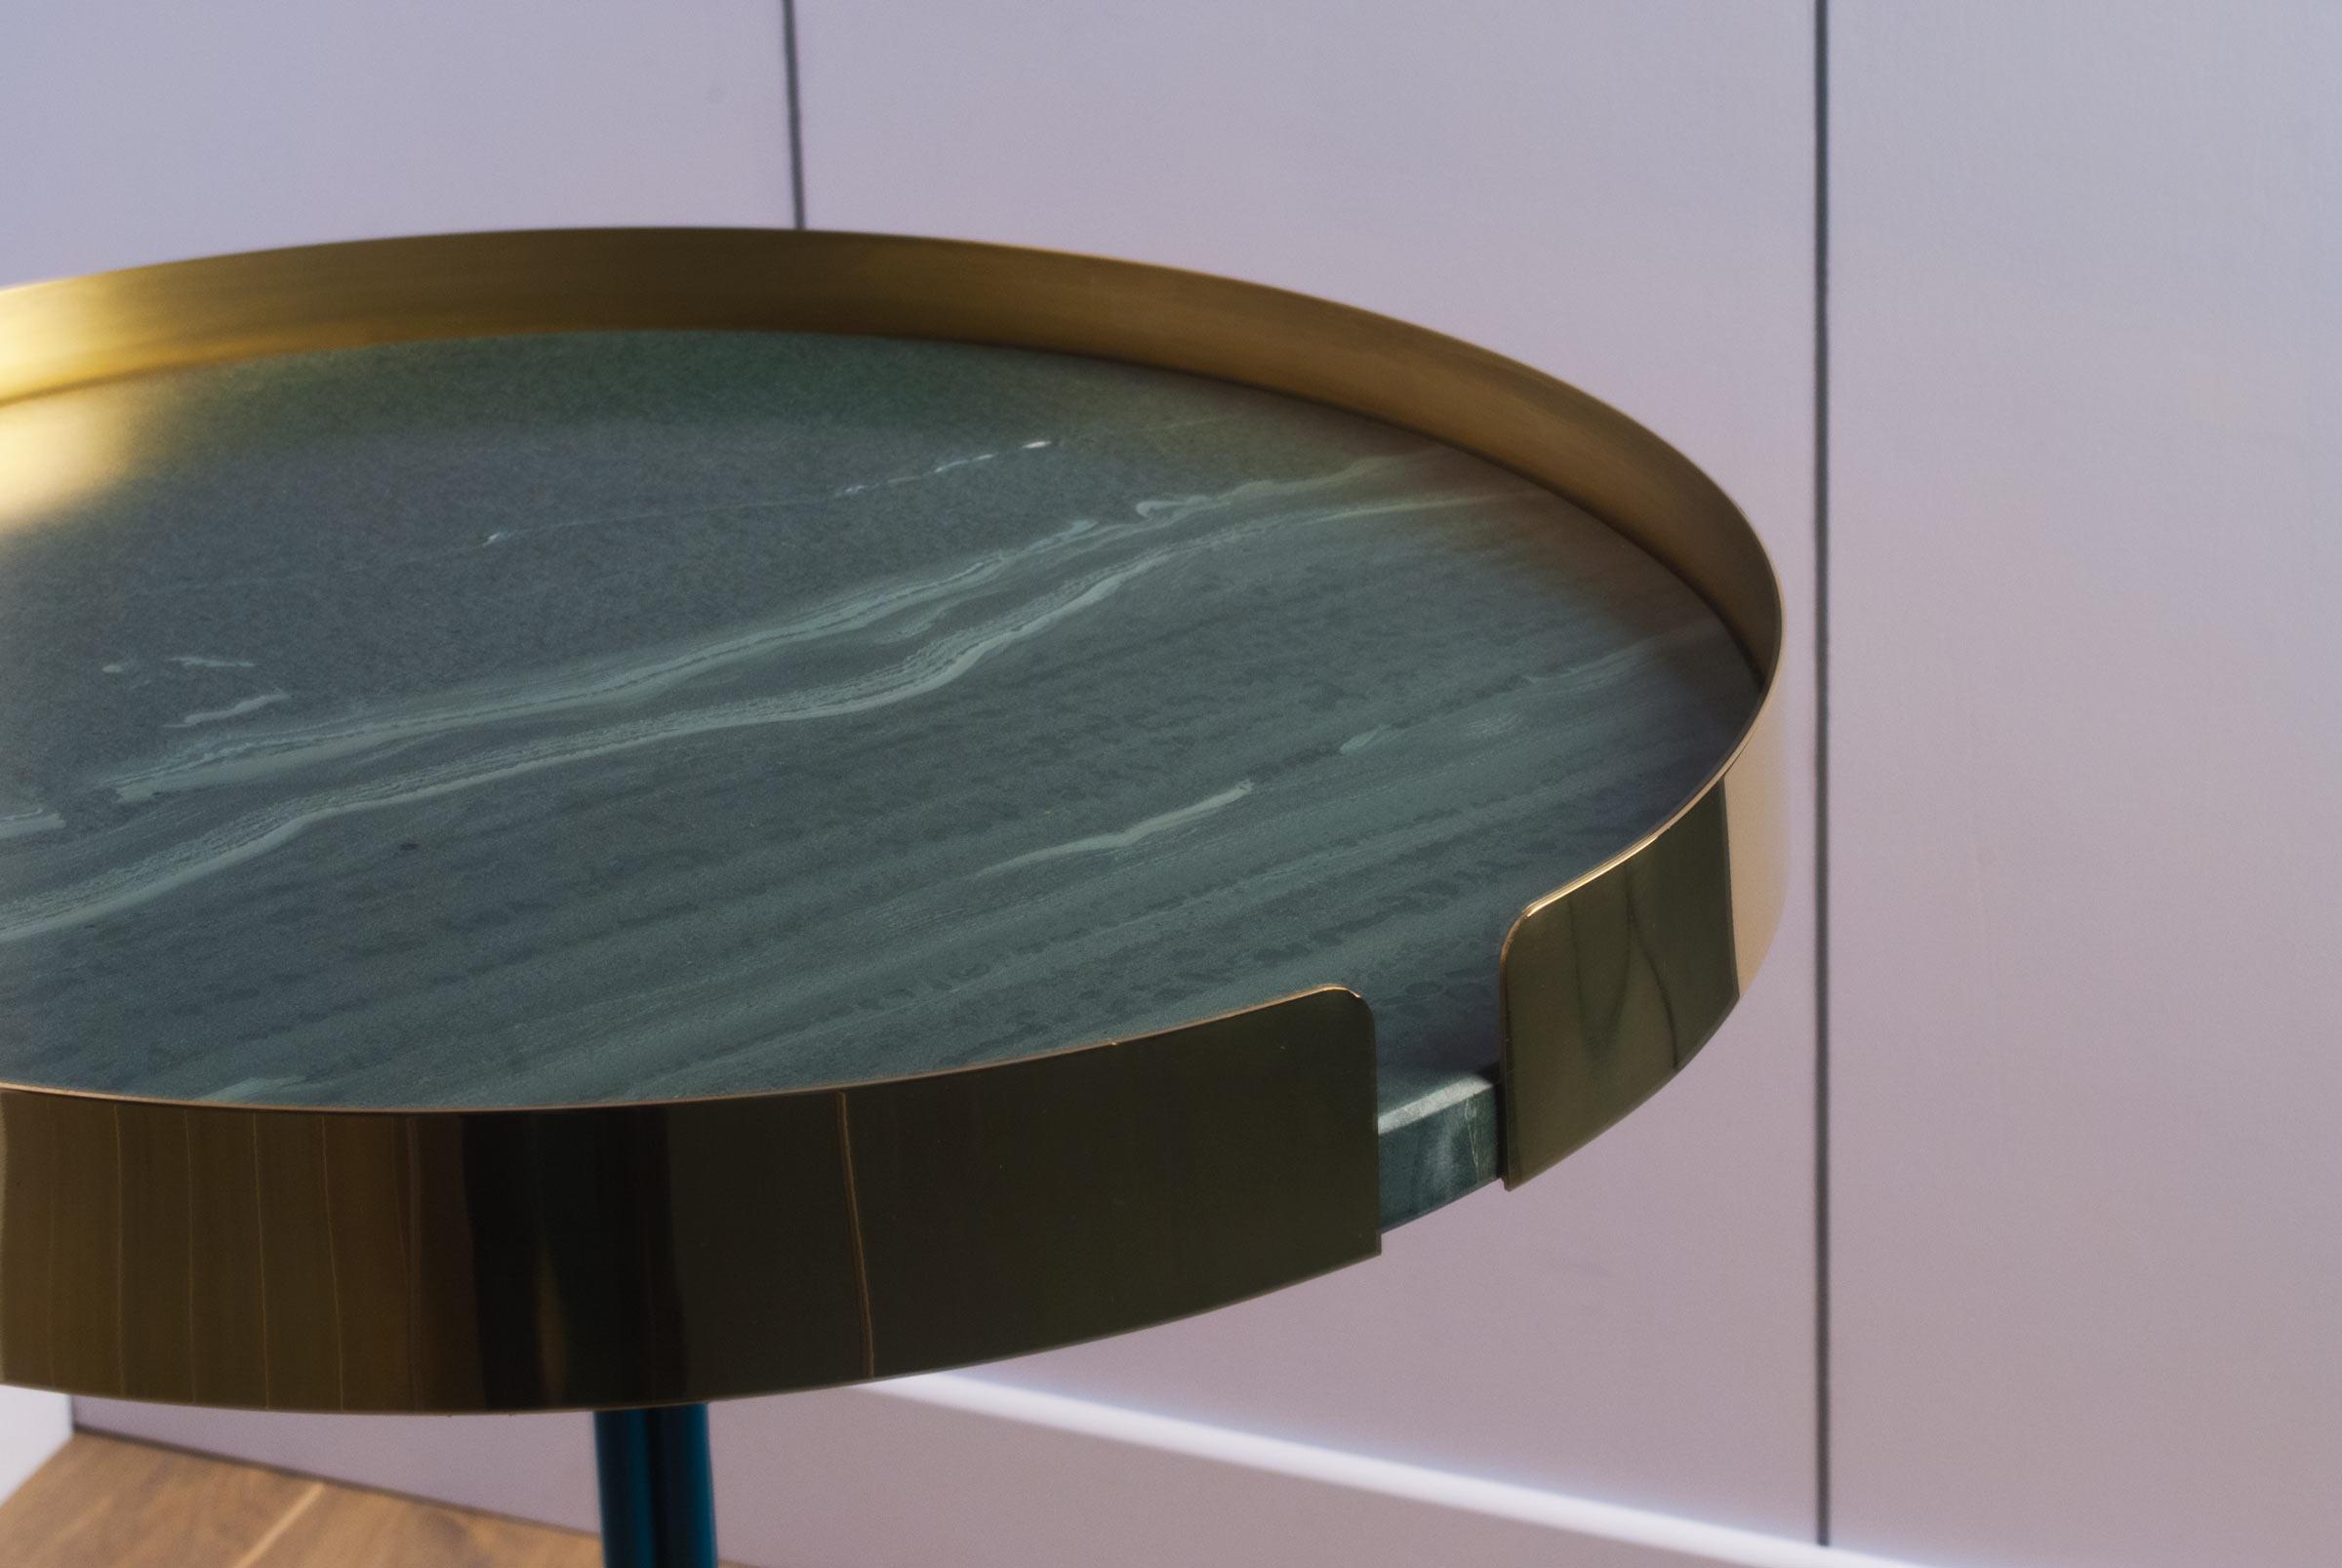 slate-table-edge-detail-comp.jpg